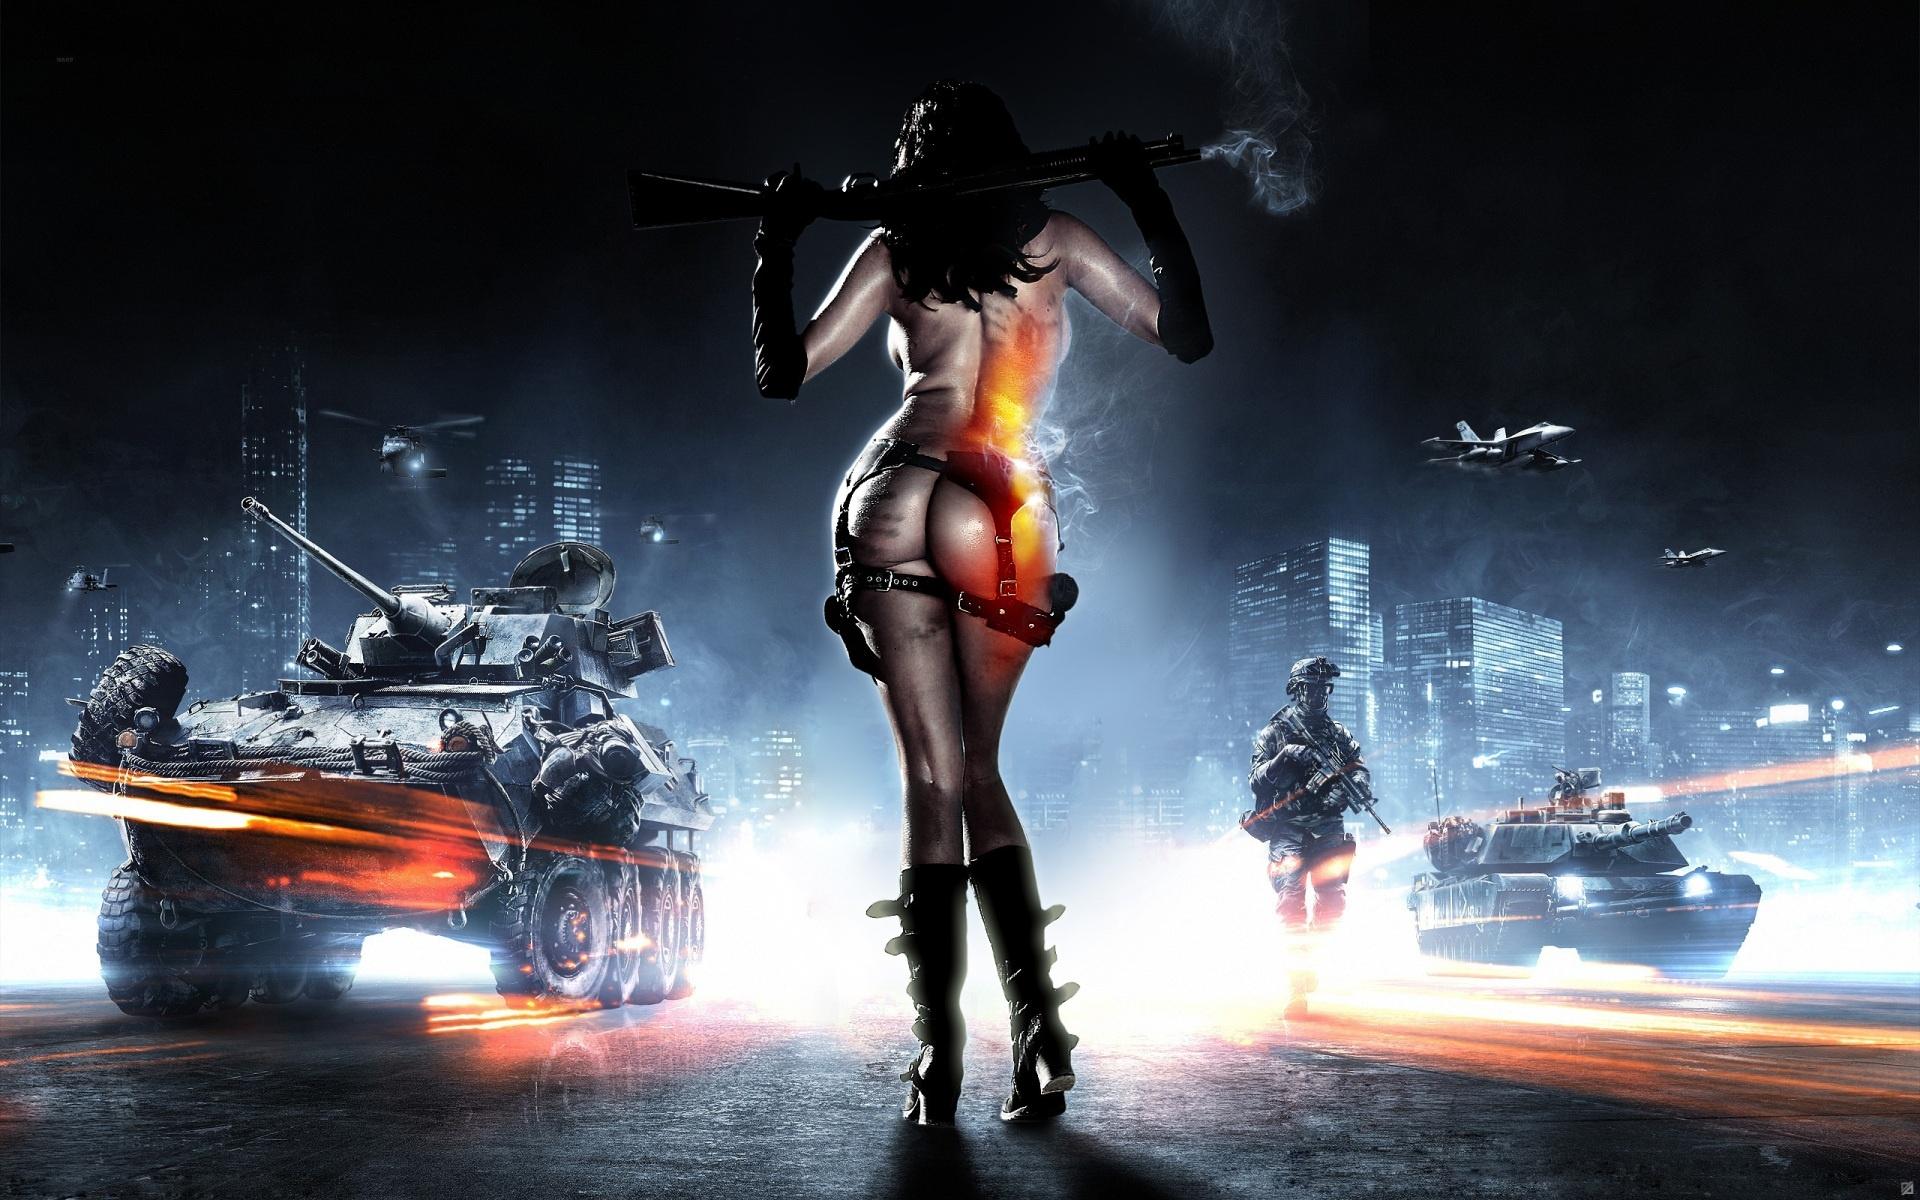 http://3.bp.blogspot.com/-Y3Xuo1QW2_w/UDTtdX05-NI/AAAAAAAADpY/V7WKr2q_I8g/s1920/battlefield-3-women-1200.jpg